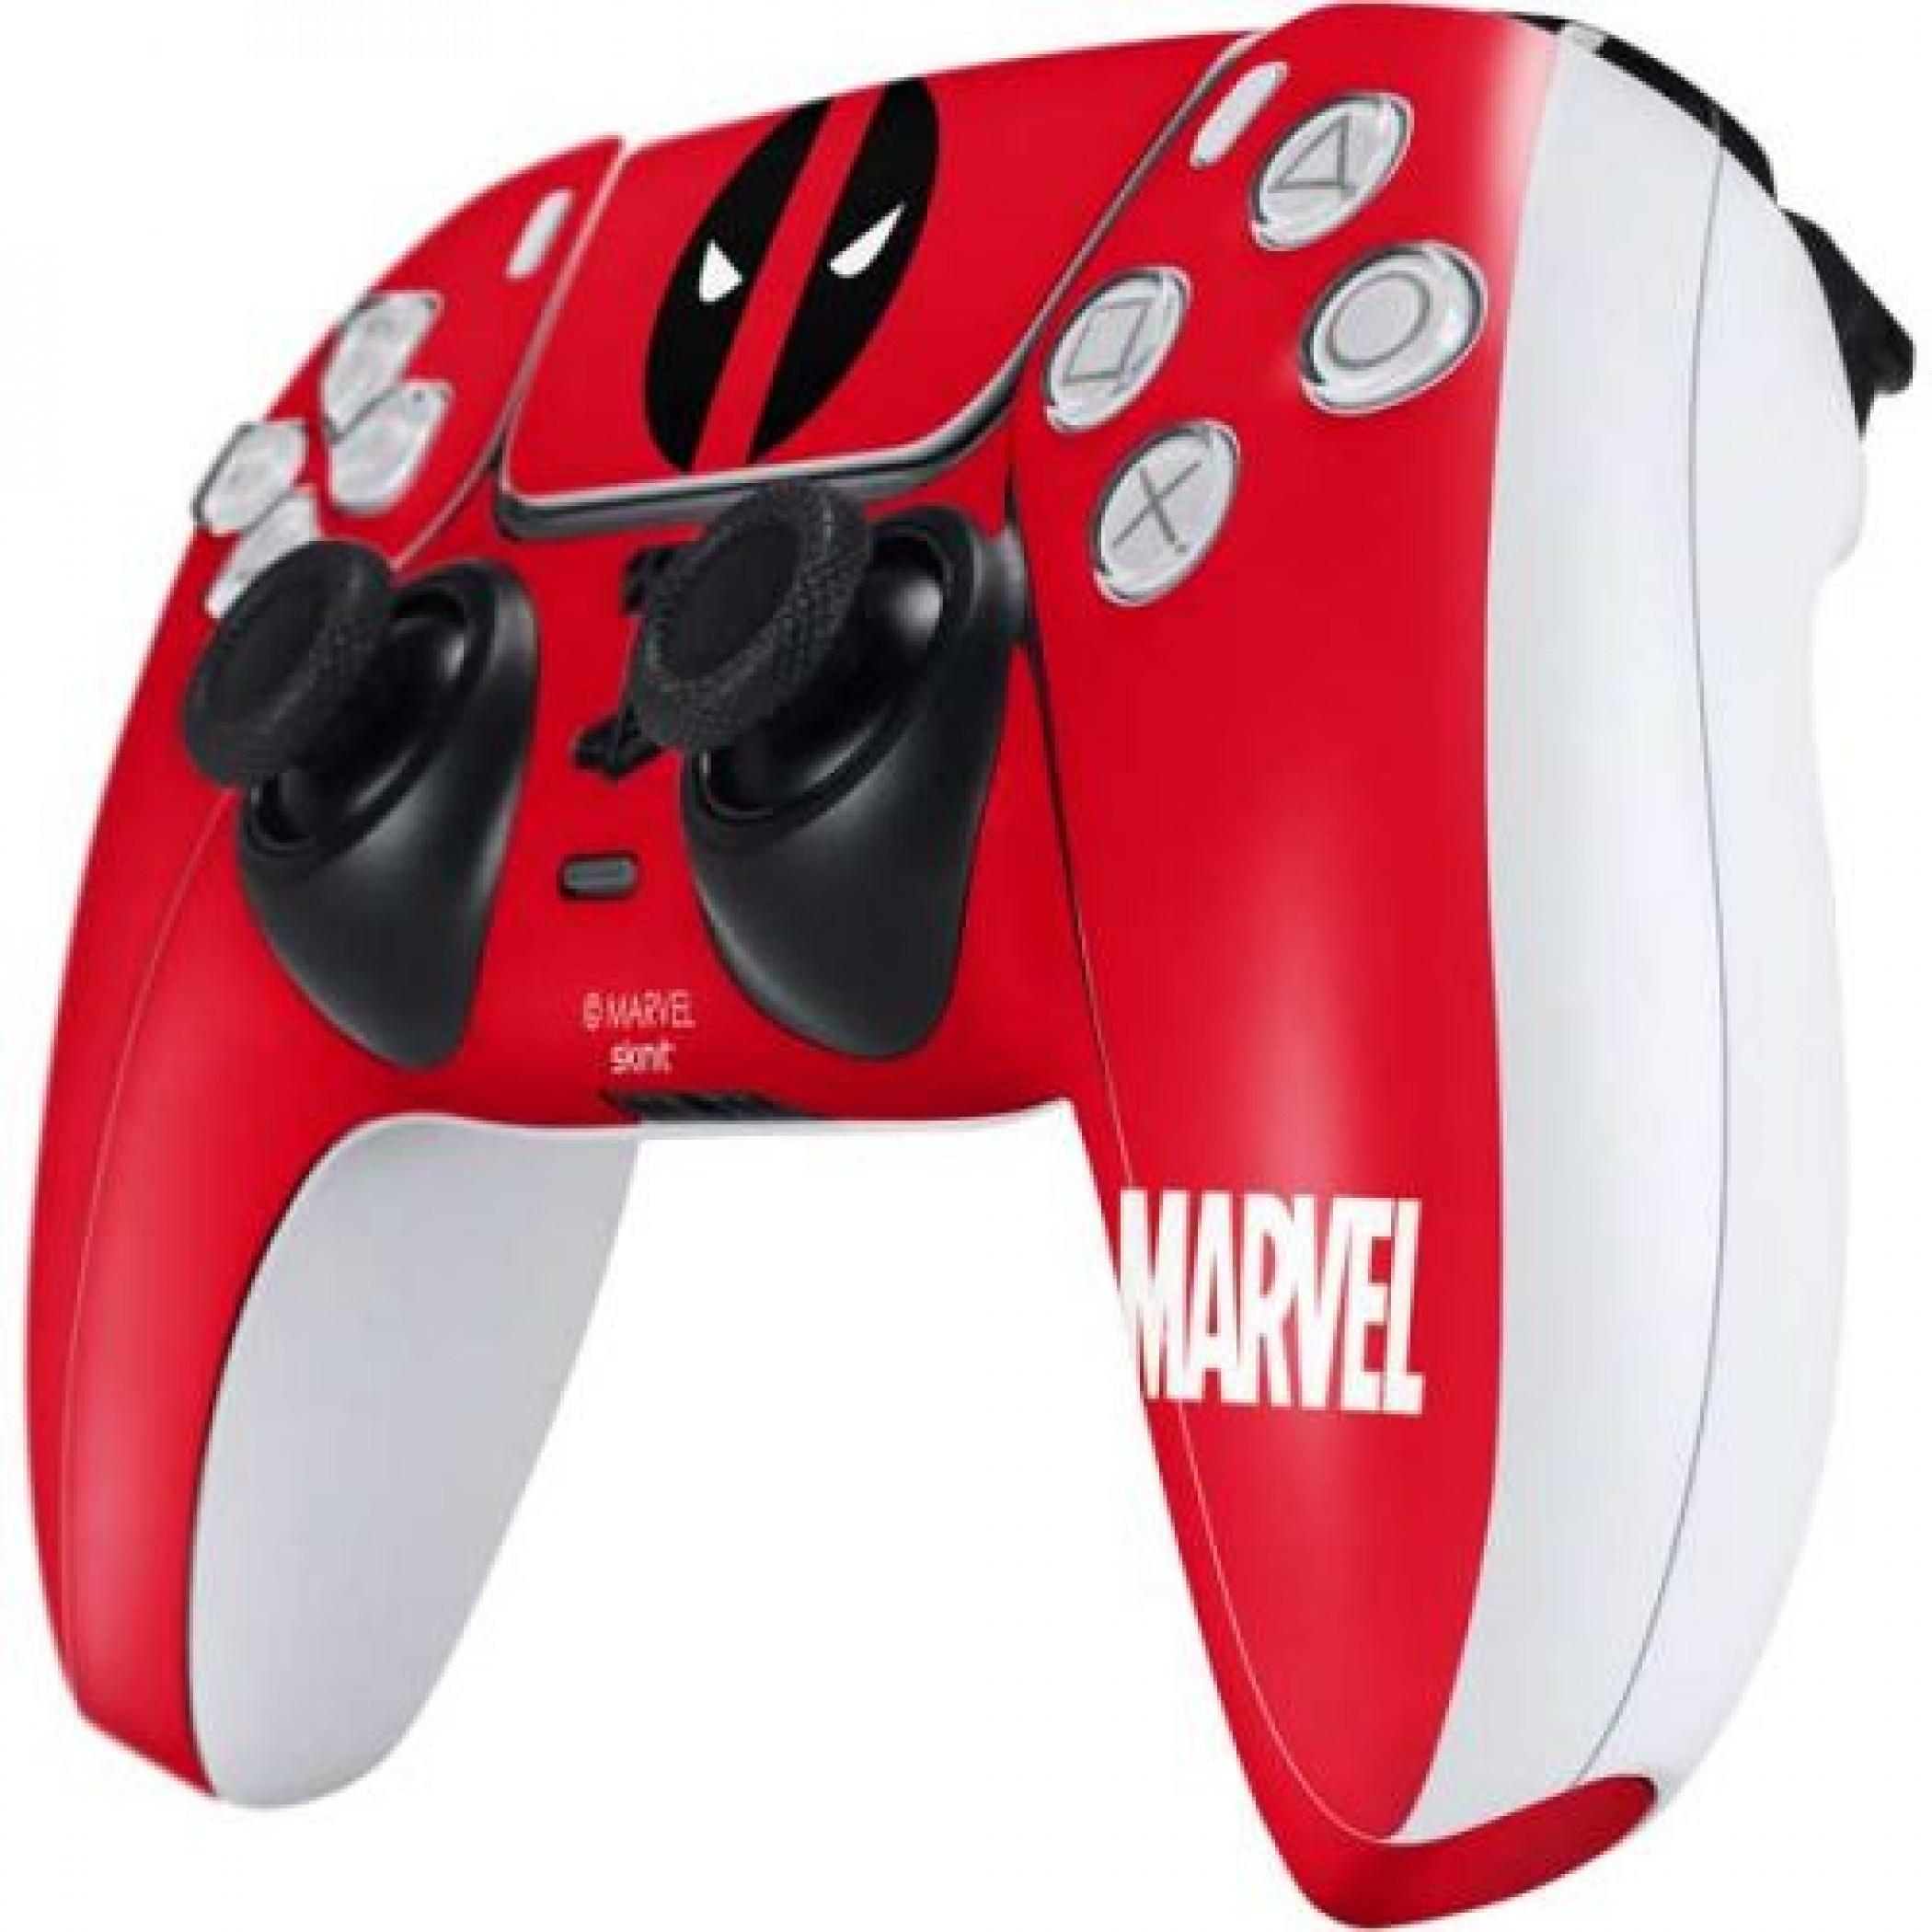 Deadpool Logo Red PS5 Controller Skin